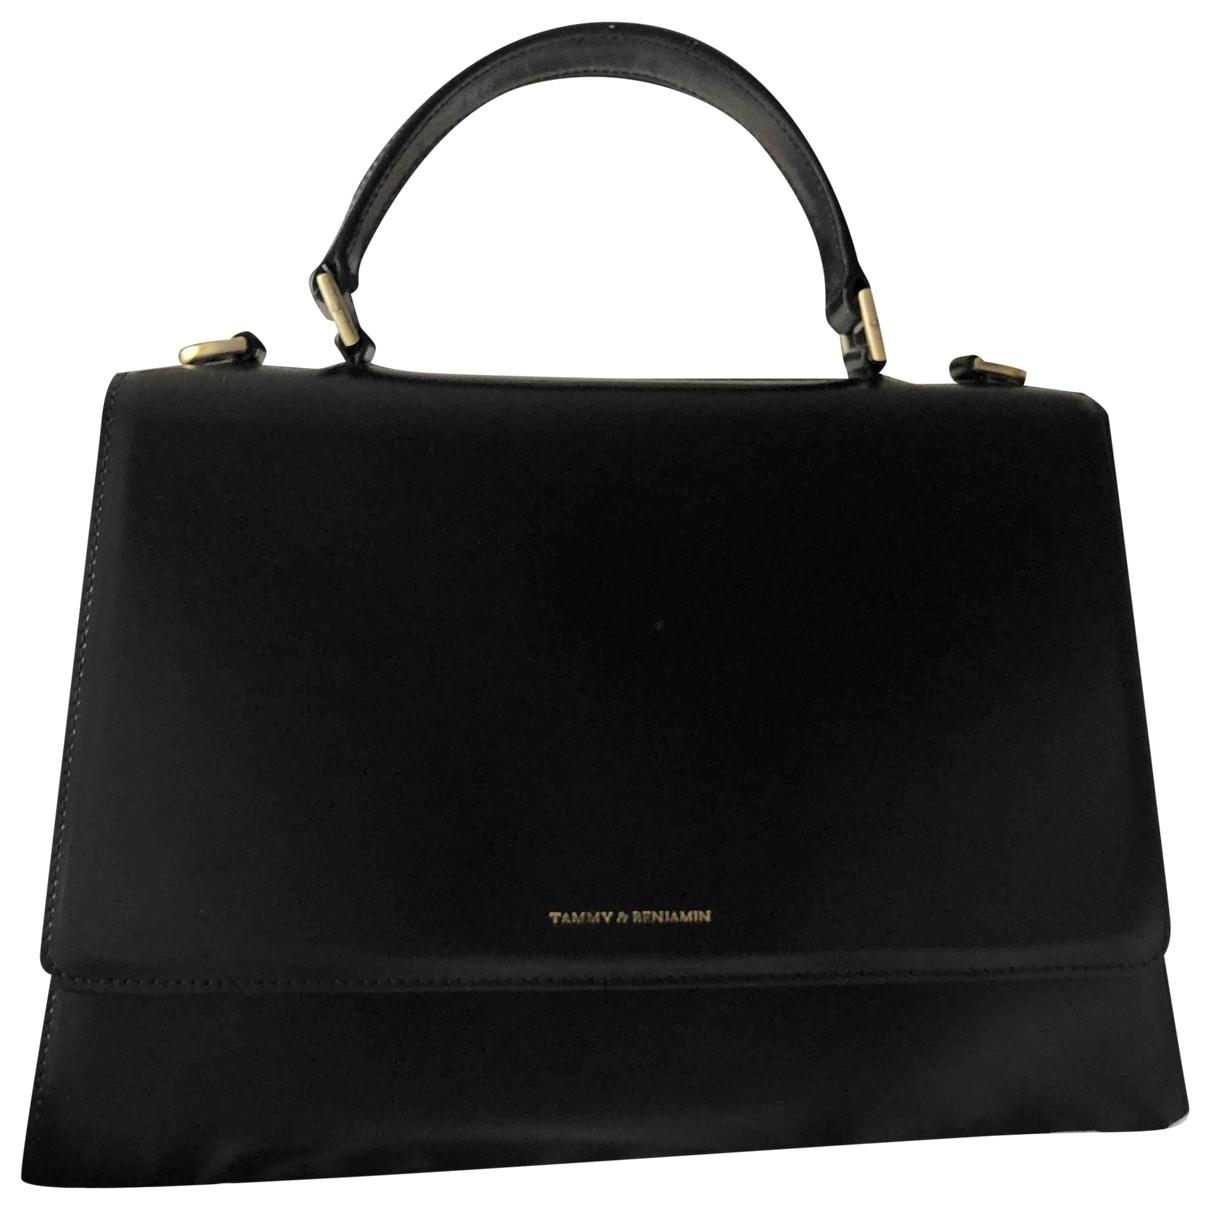 Tammy And Benjamin \N Black Leather handbag for Women \N